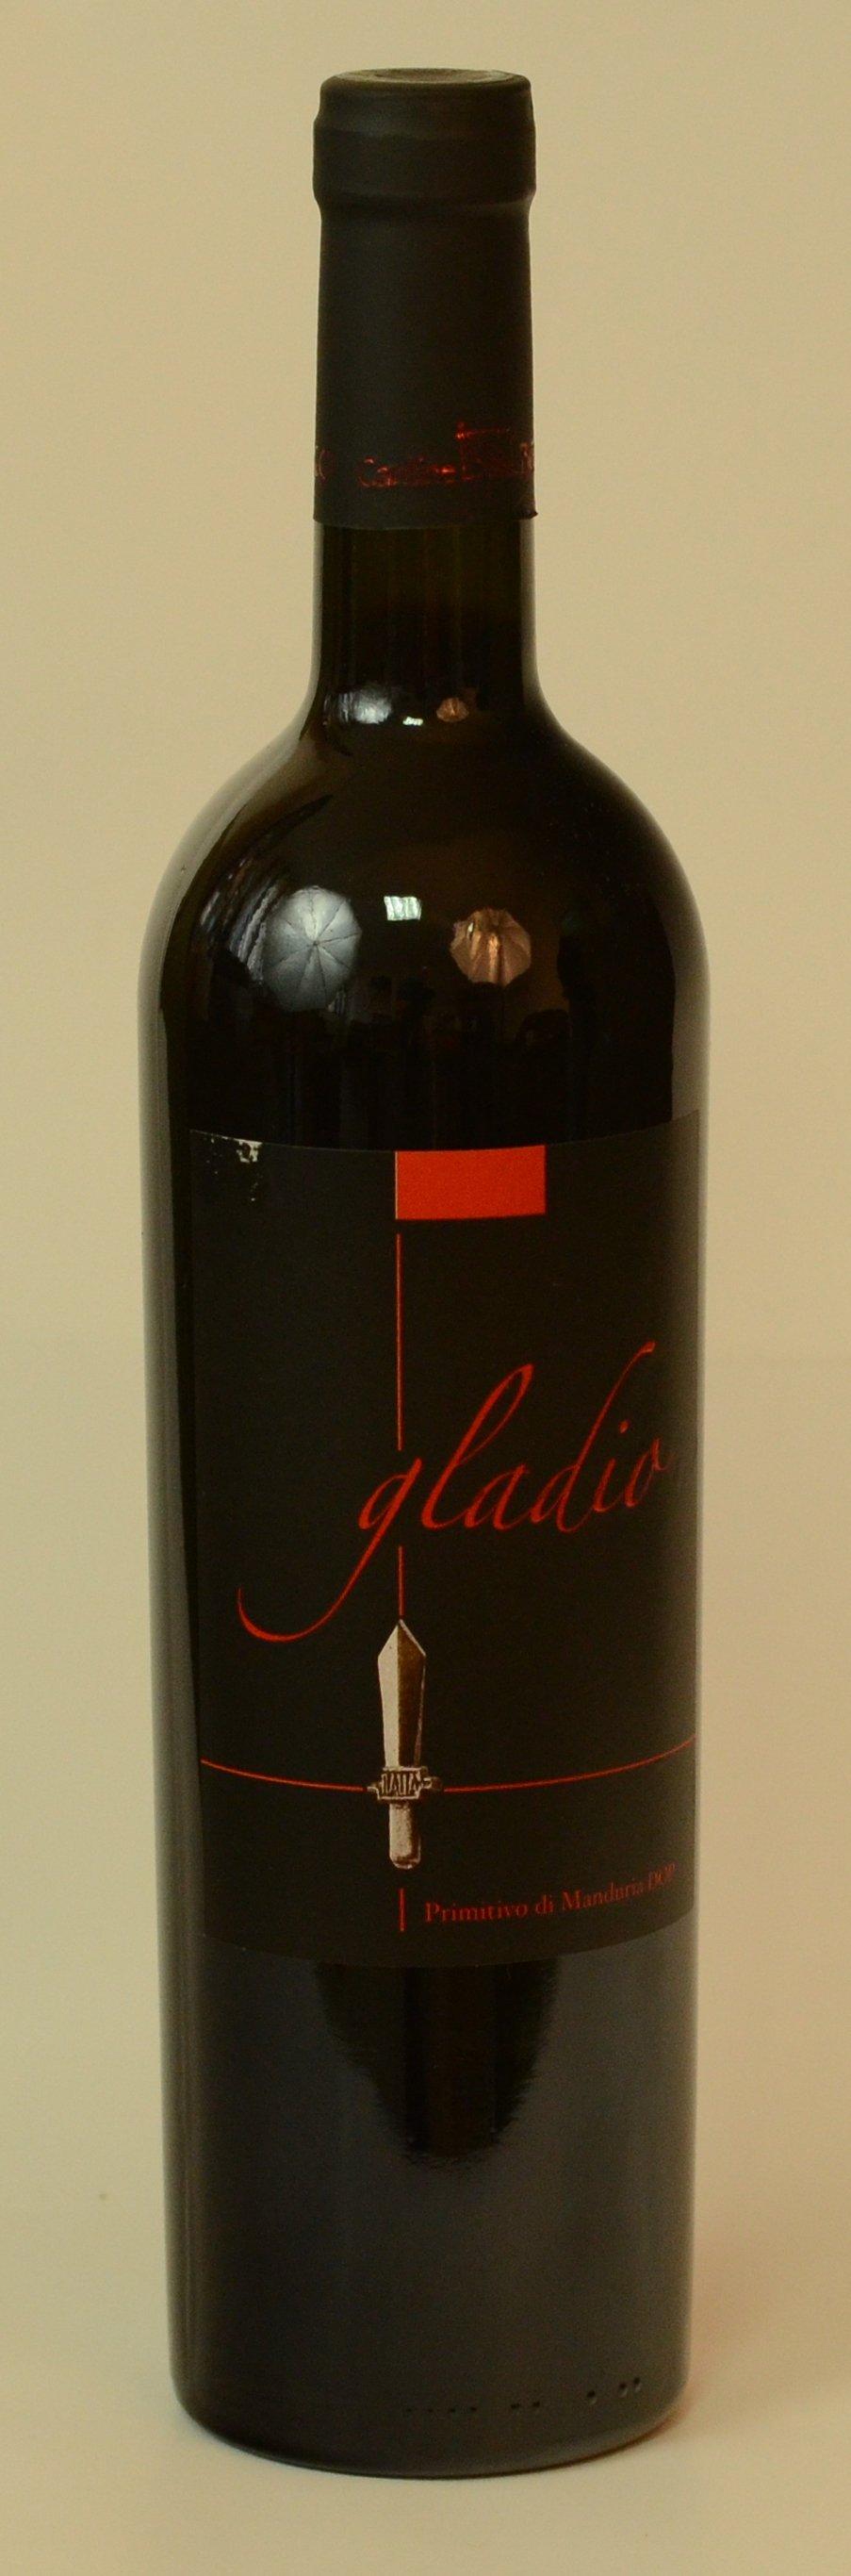 "GLADIO  Vin ,,Primitivo di Manduria"" DOC ( Denumire de Origine Controlata ) SEC       16 º Vol"